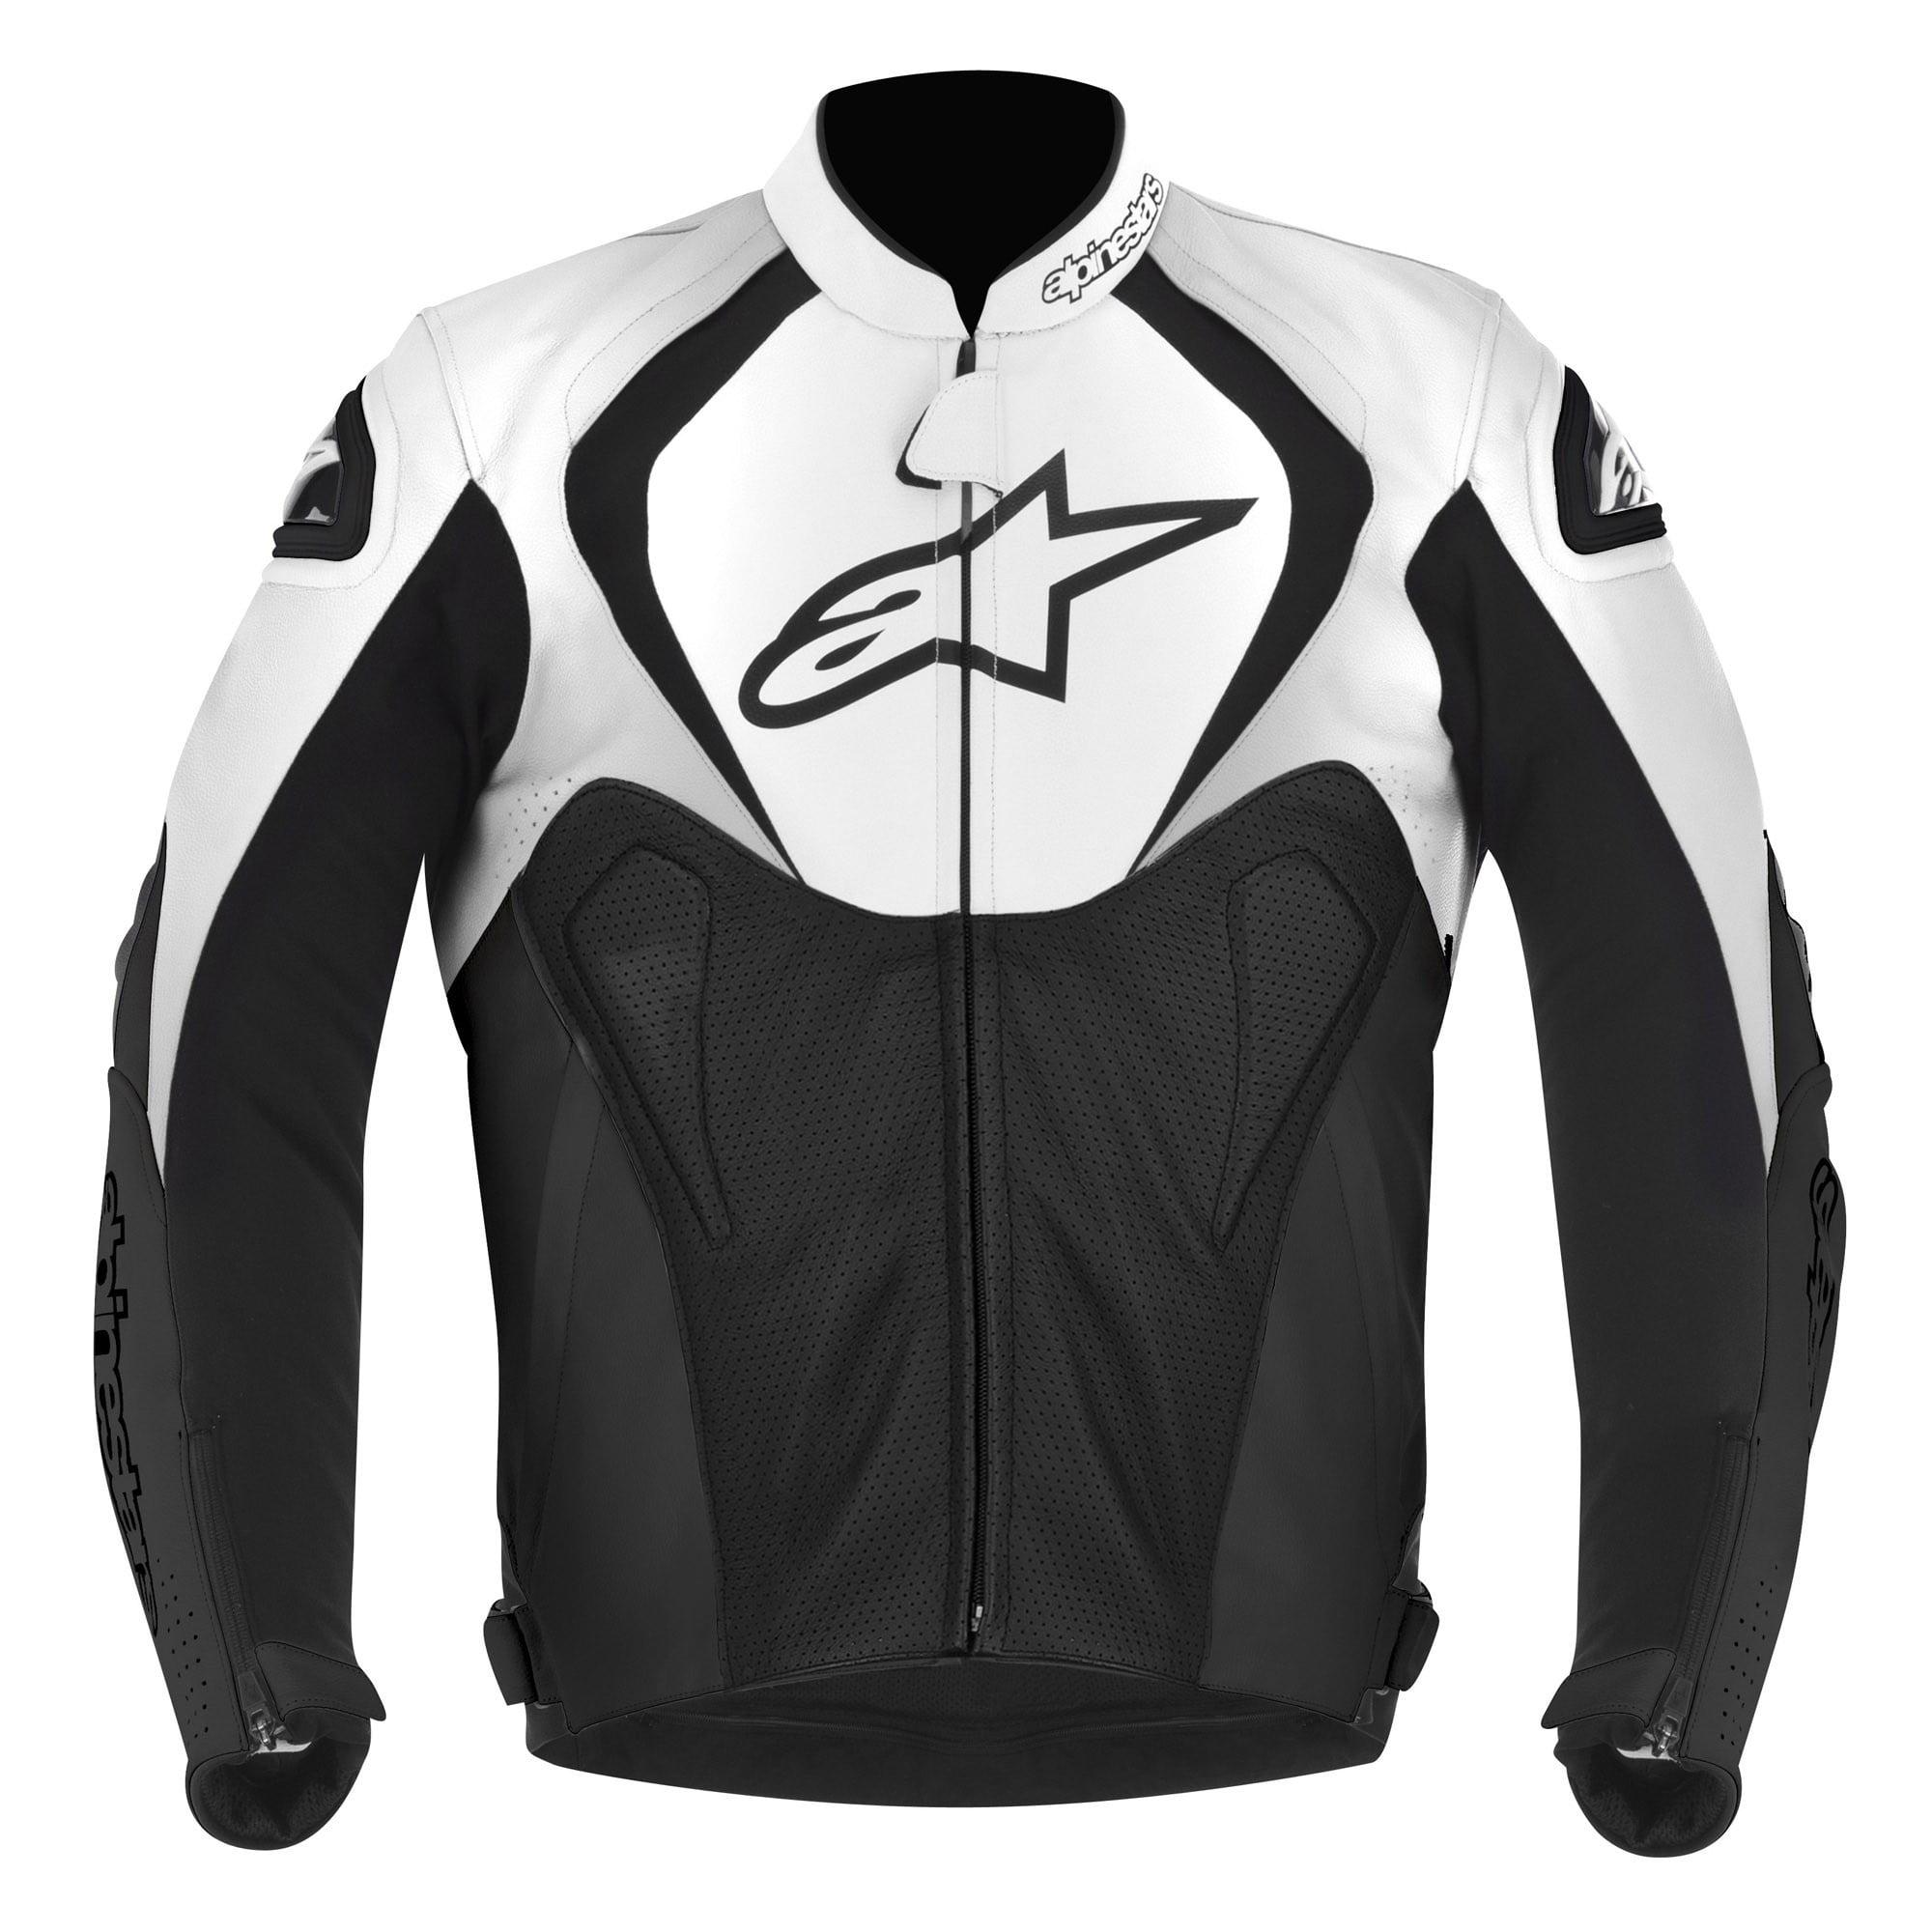 Alpinestars Jaws Perforated Leather Jacket Black/White 58 EUR